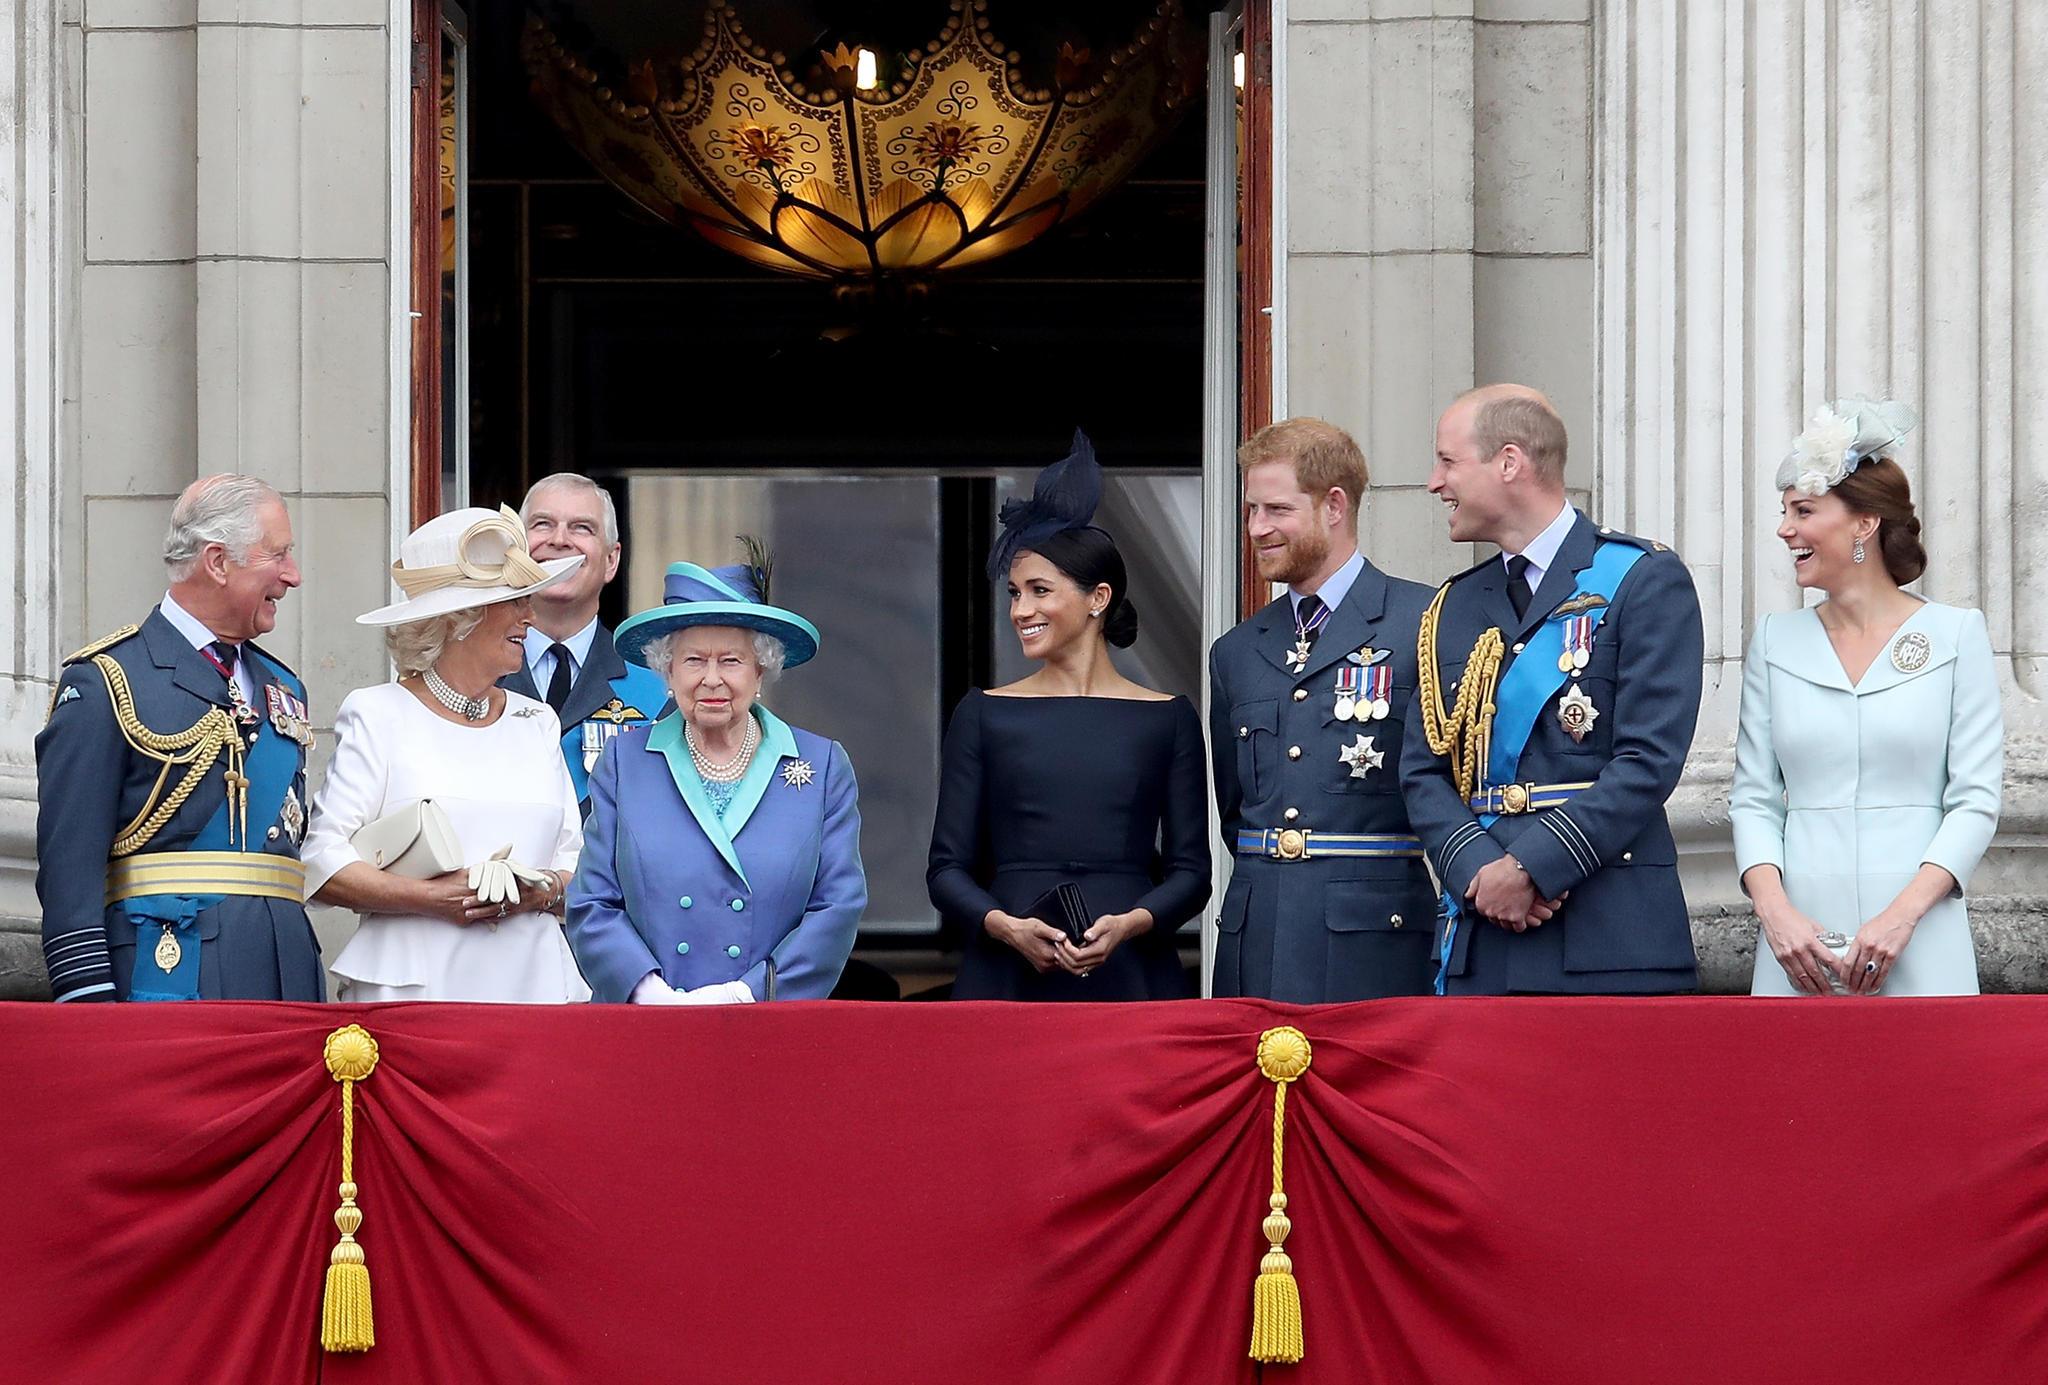 Prinz Charles, Herzogin Camilla, Prinz Andrew, Queen Elizabeth, Herzogin Meghan, Prinz Harry, Prinz William und Herzogin Catherine